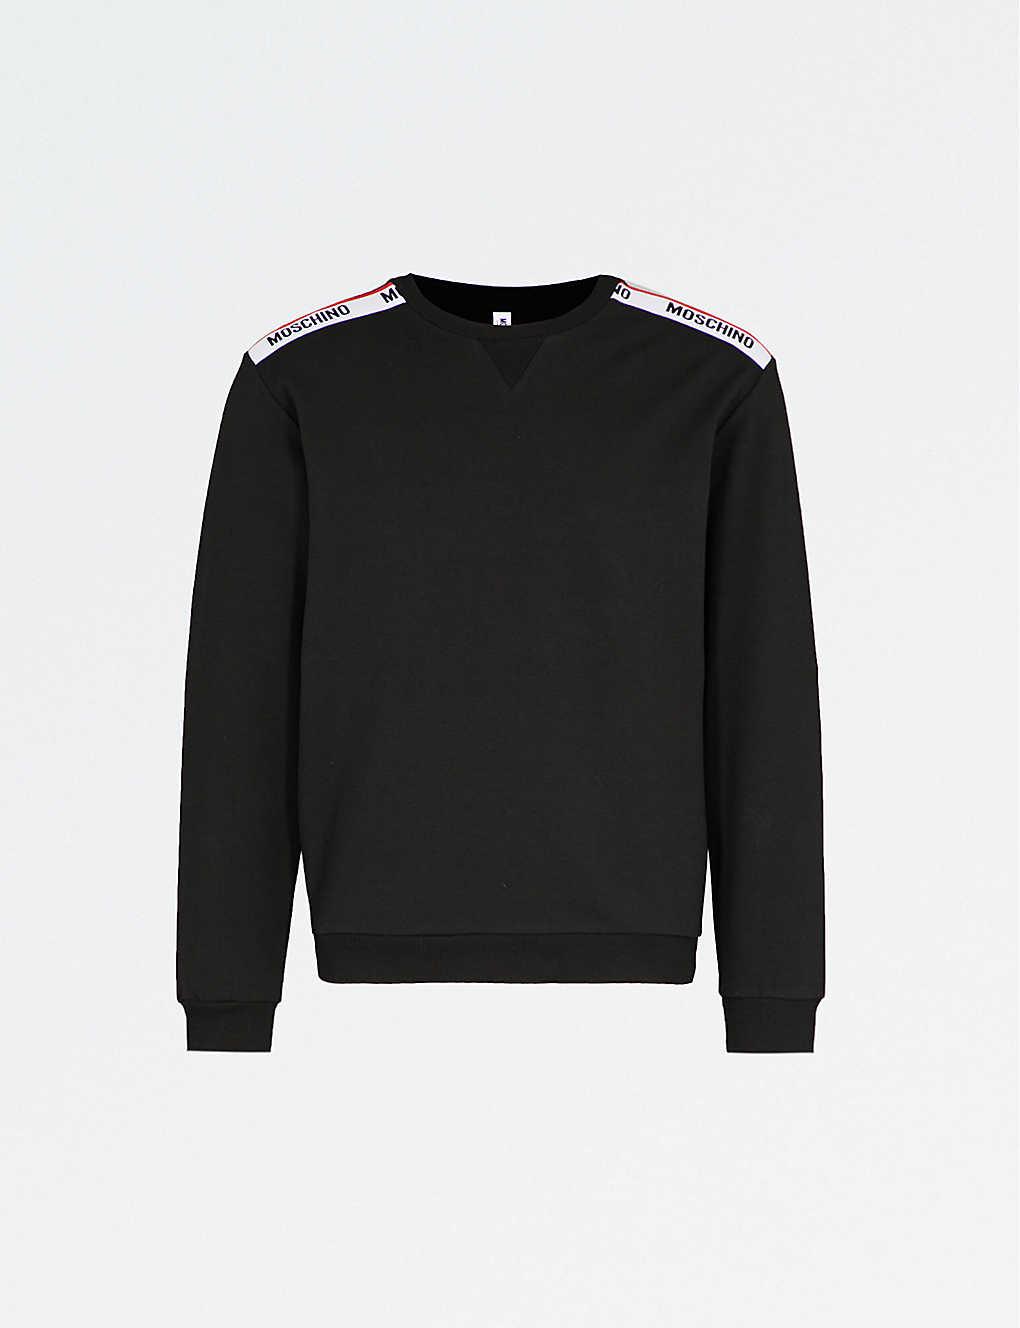 796d2cc2 MOSCHINO - Logo-tape cotton-jersey sweatshirt | Selfridges.com